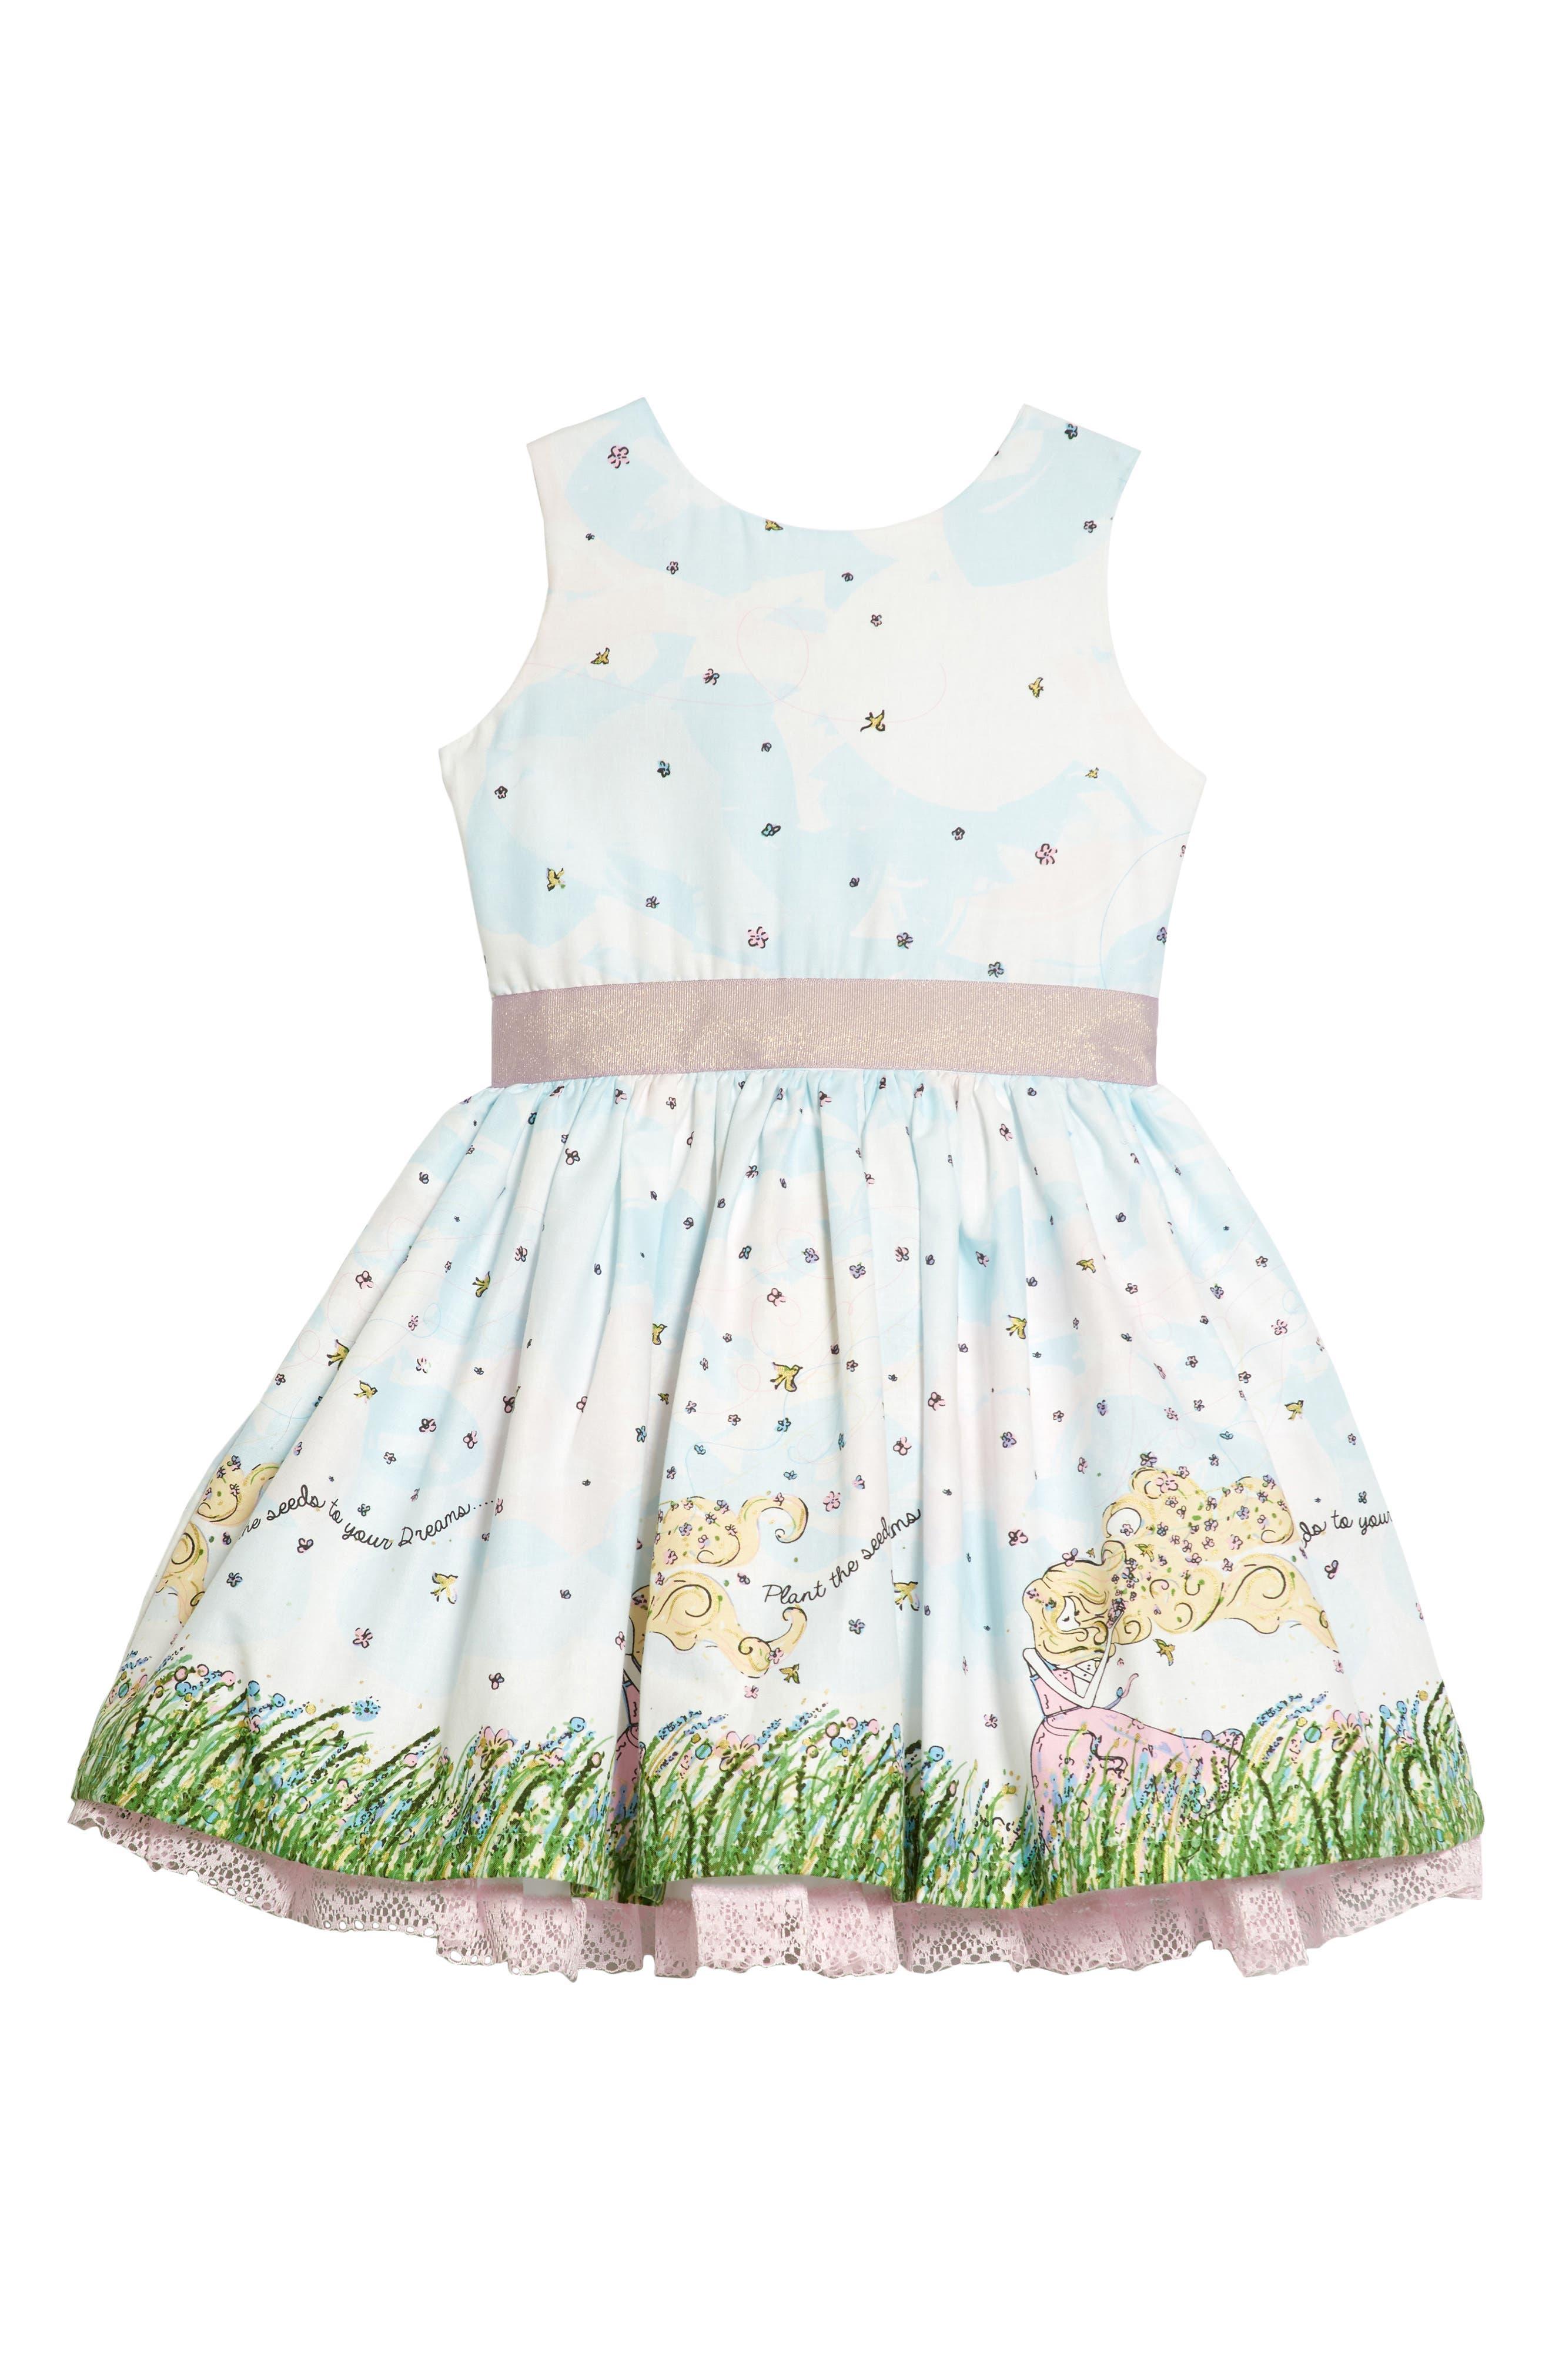 Fiveloaves Twofish Flower Girl Party Dress (Toddler Girls, Little Girls & Big Girls)